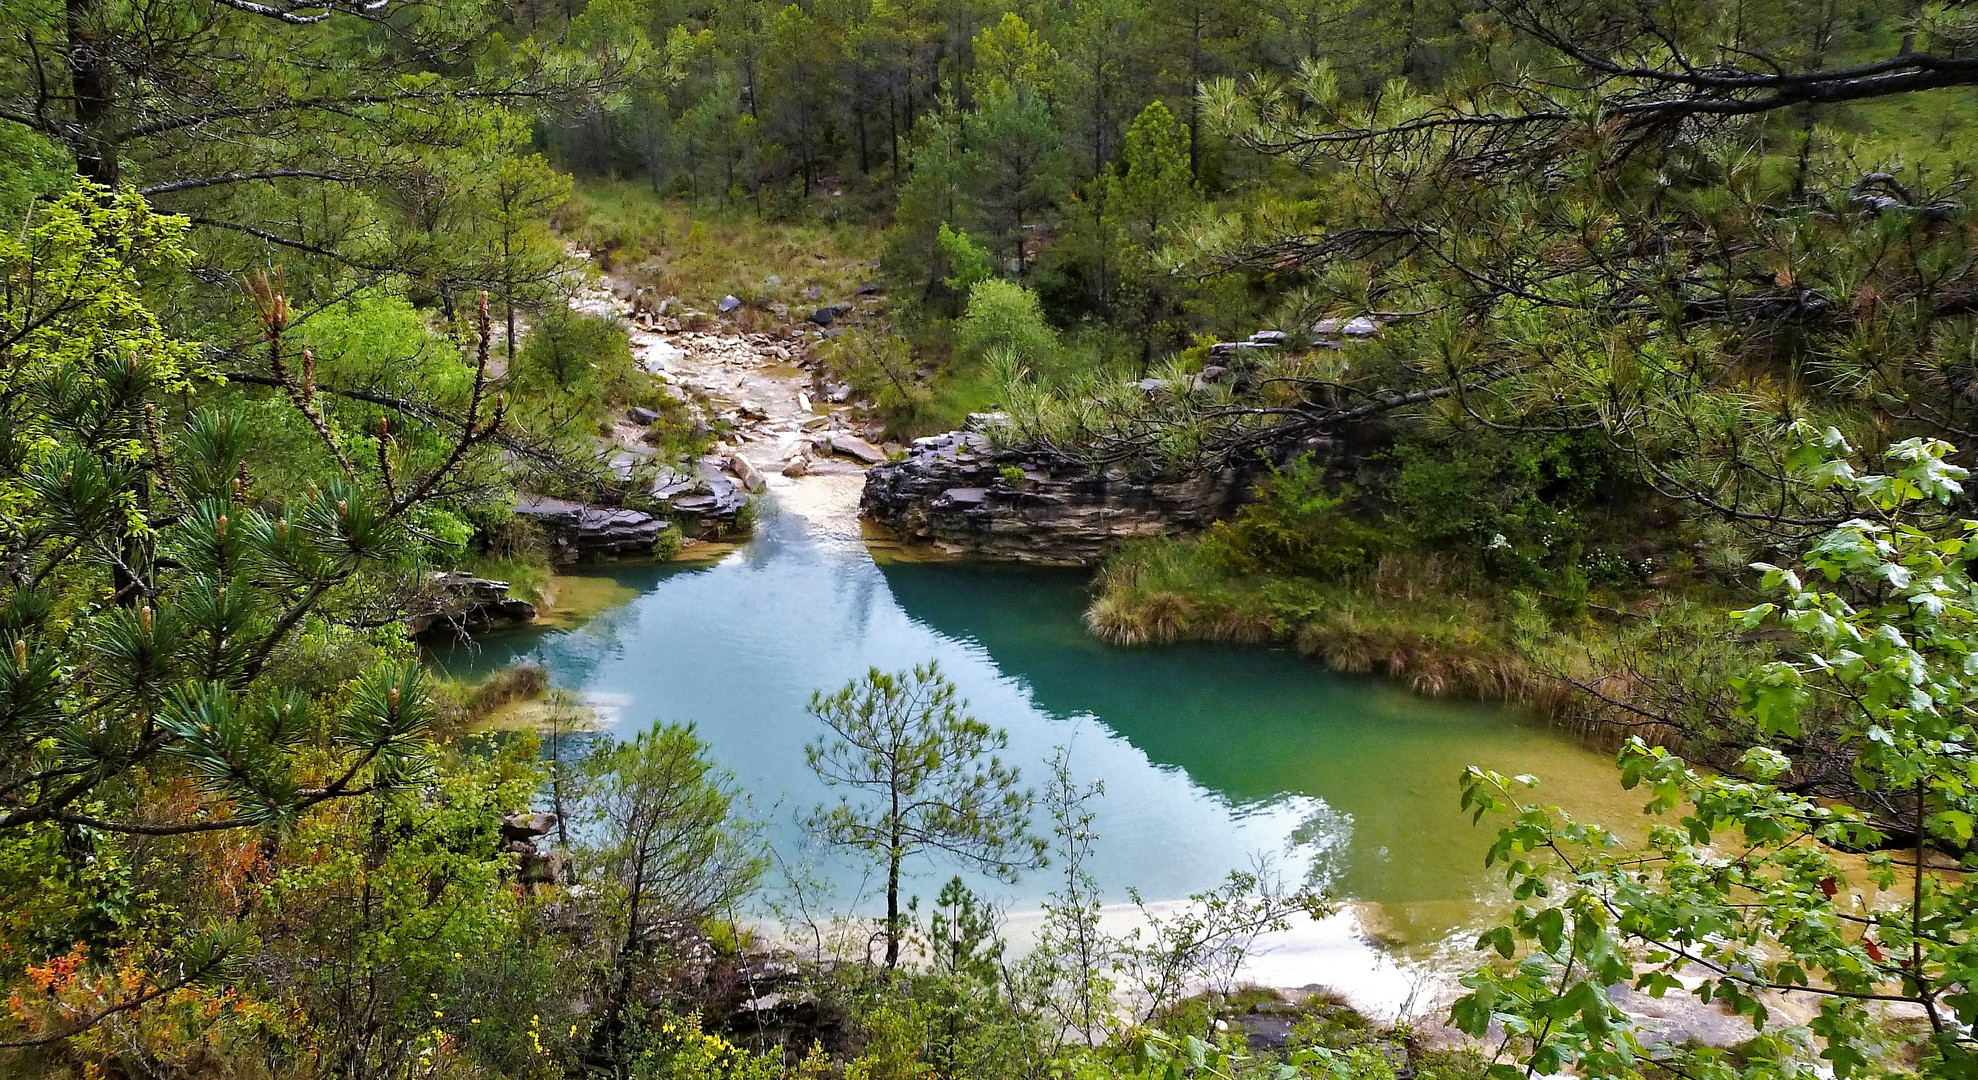 Vasque dans un canyon Aragonais (Espagne)